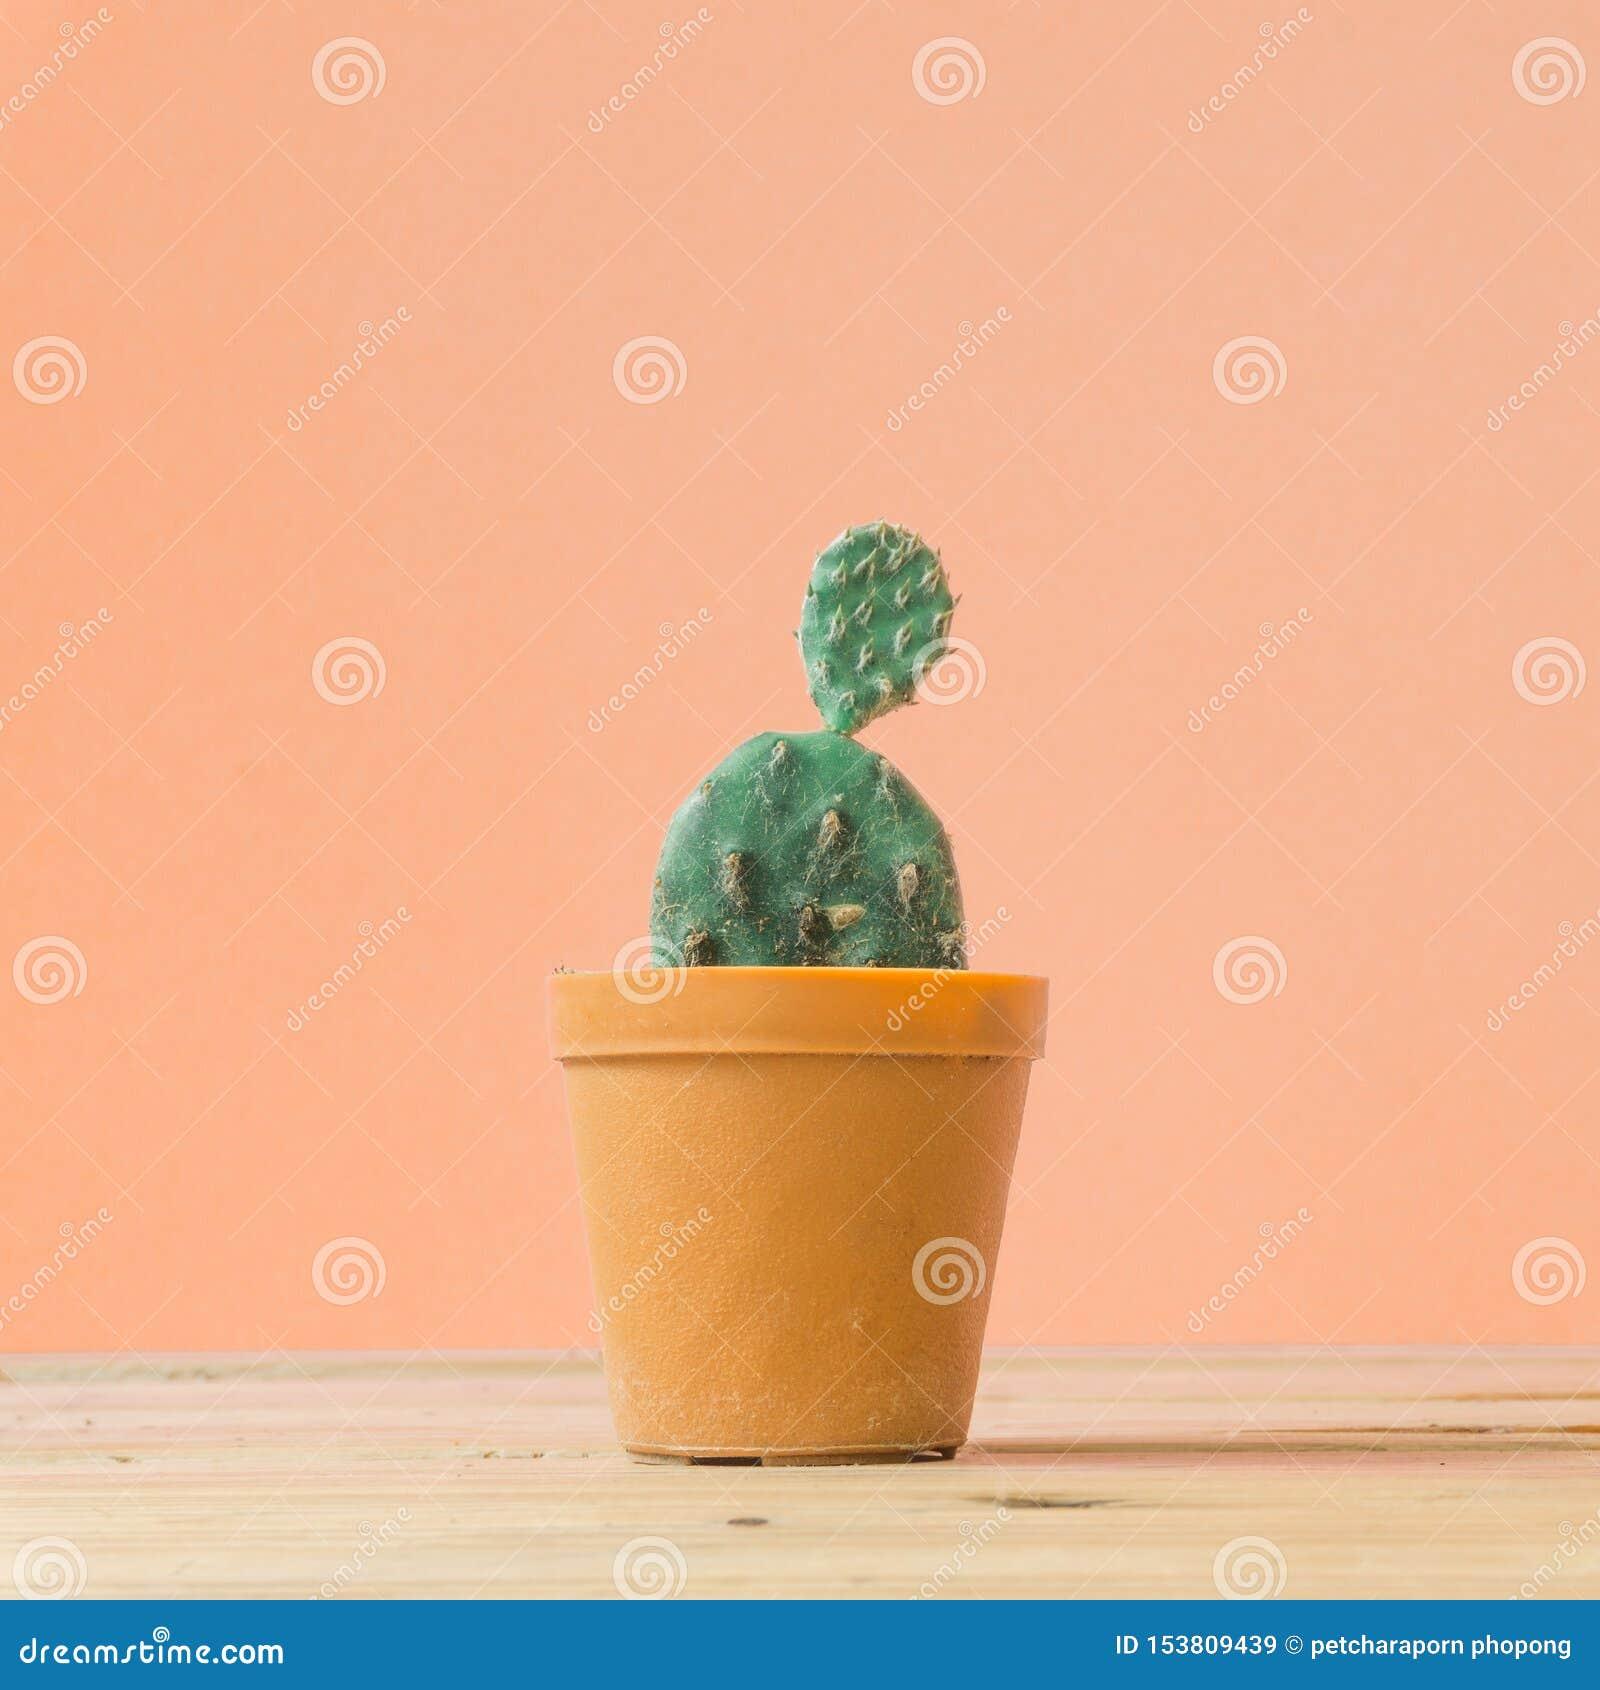 Cactus. Minimal creative stillife on wooden table and pastel orange